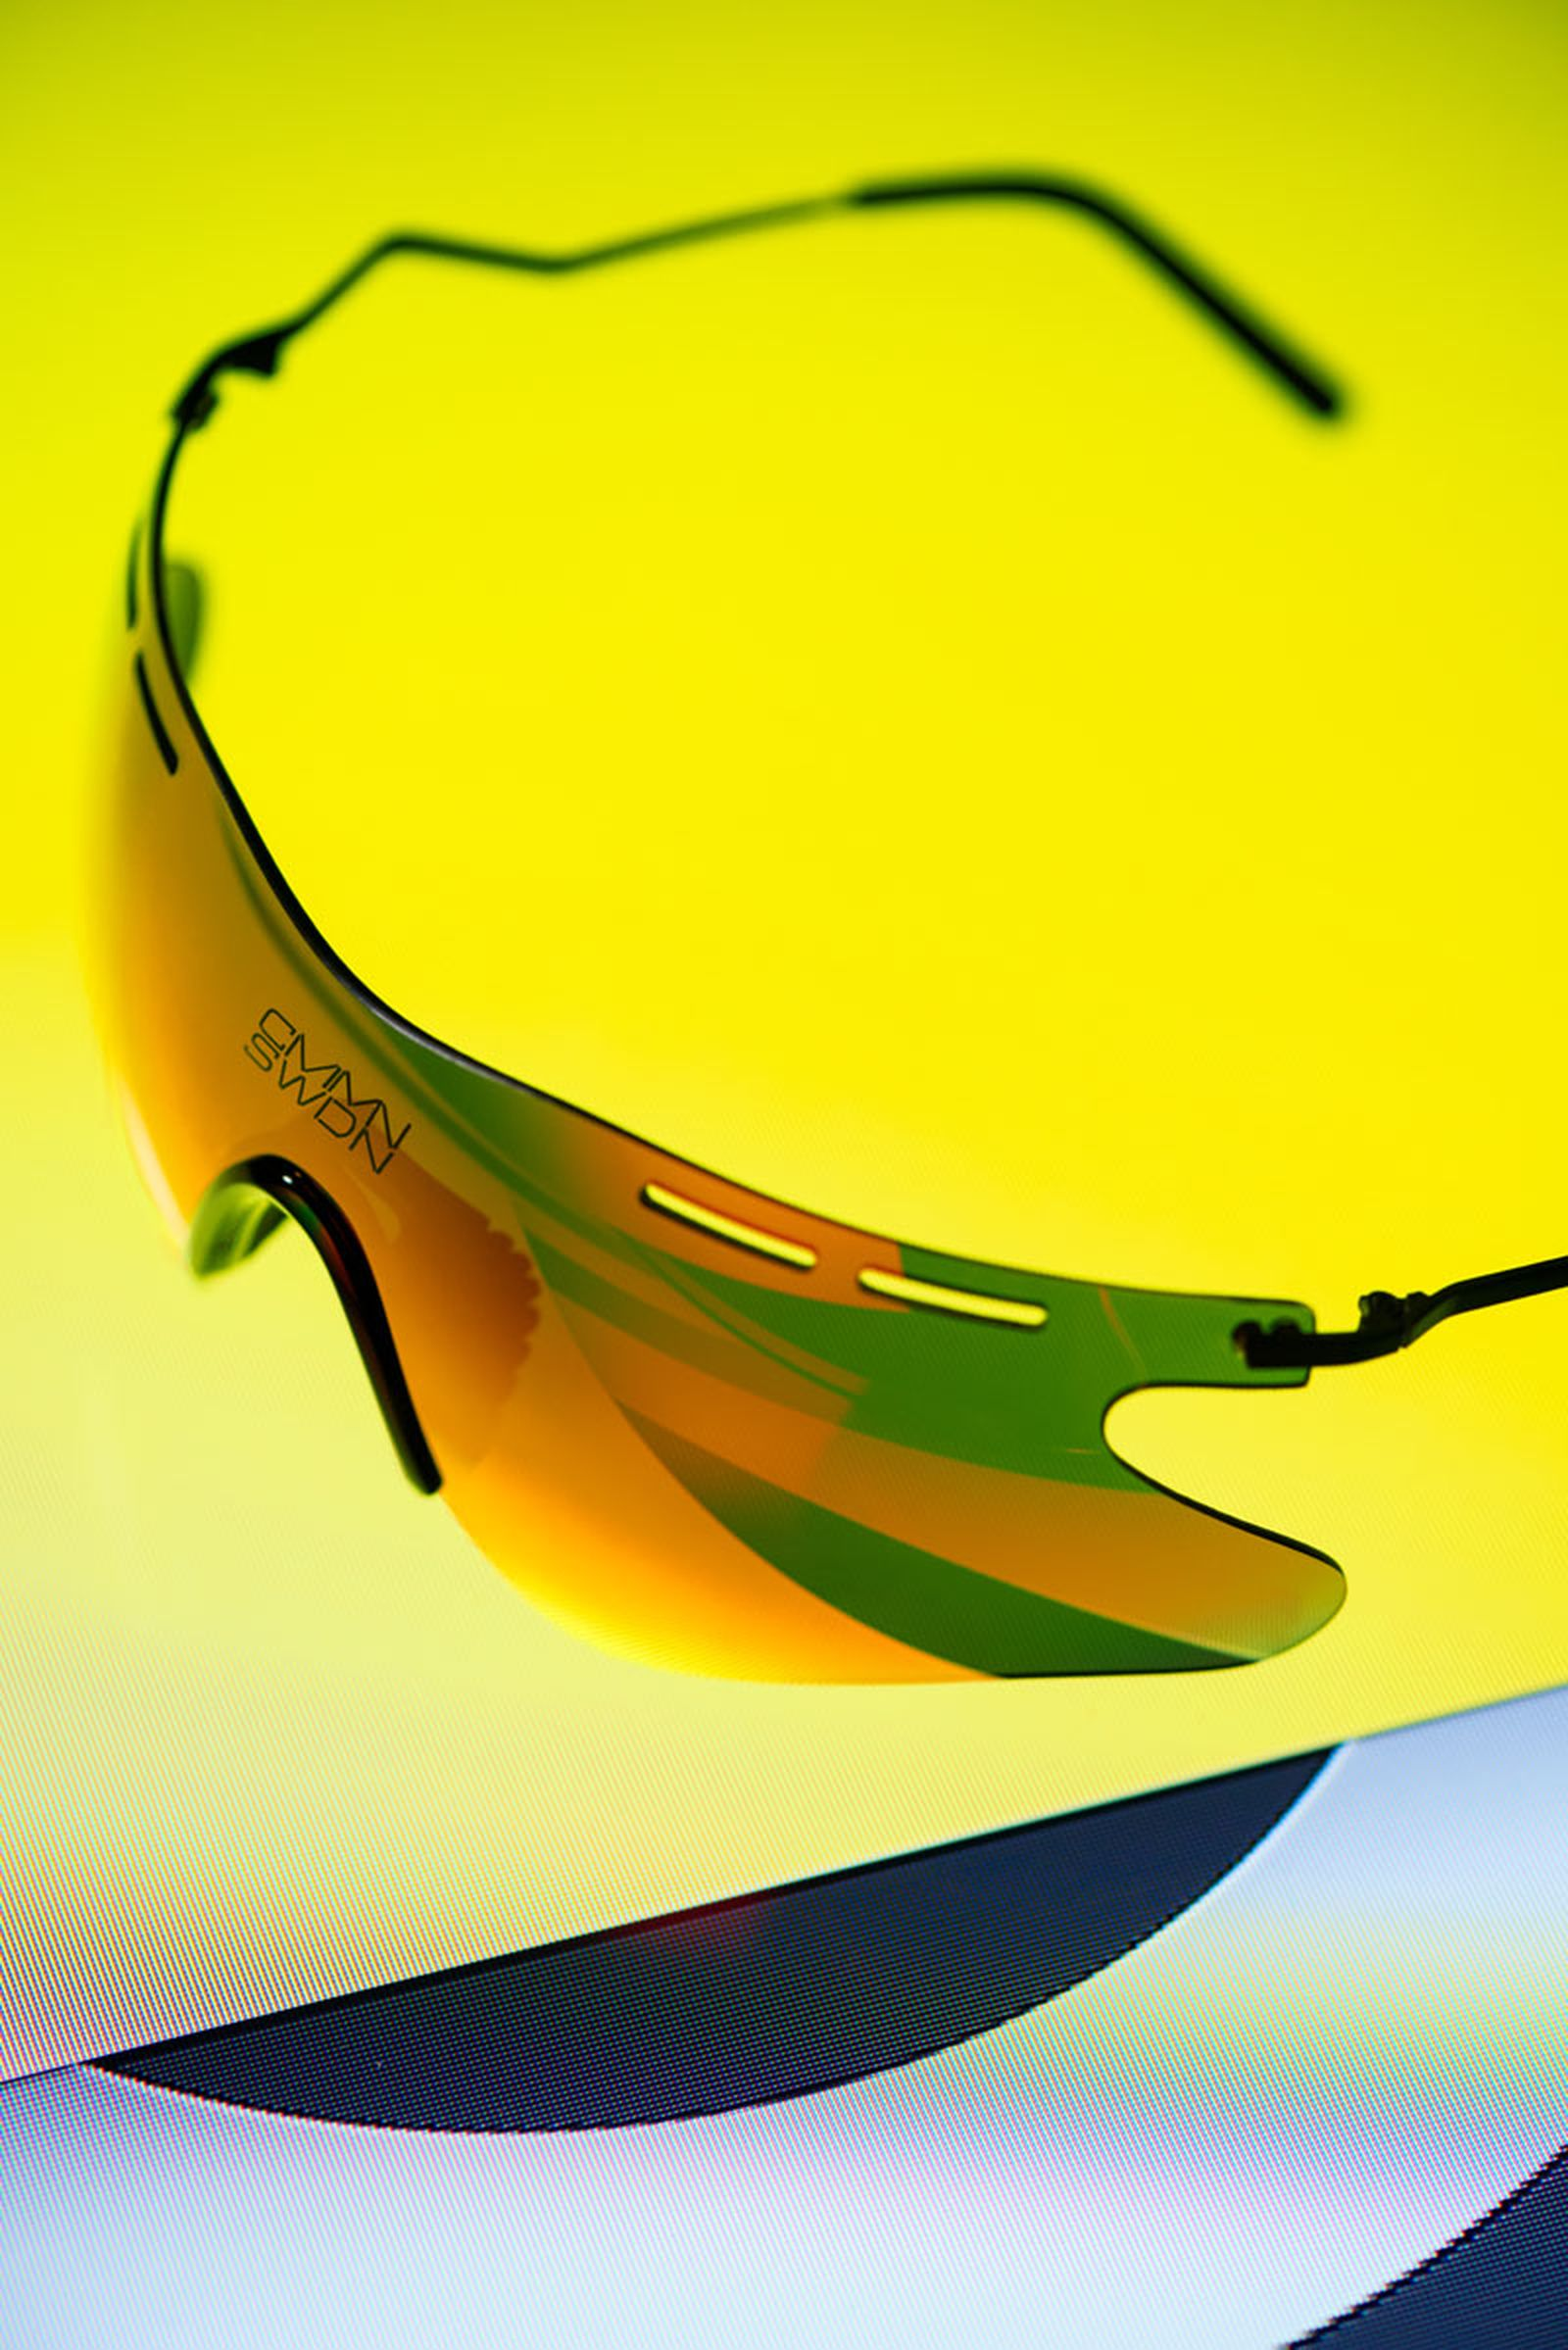 1cmmn swdn sunglasses ss19 Ace & Tate